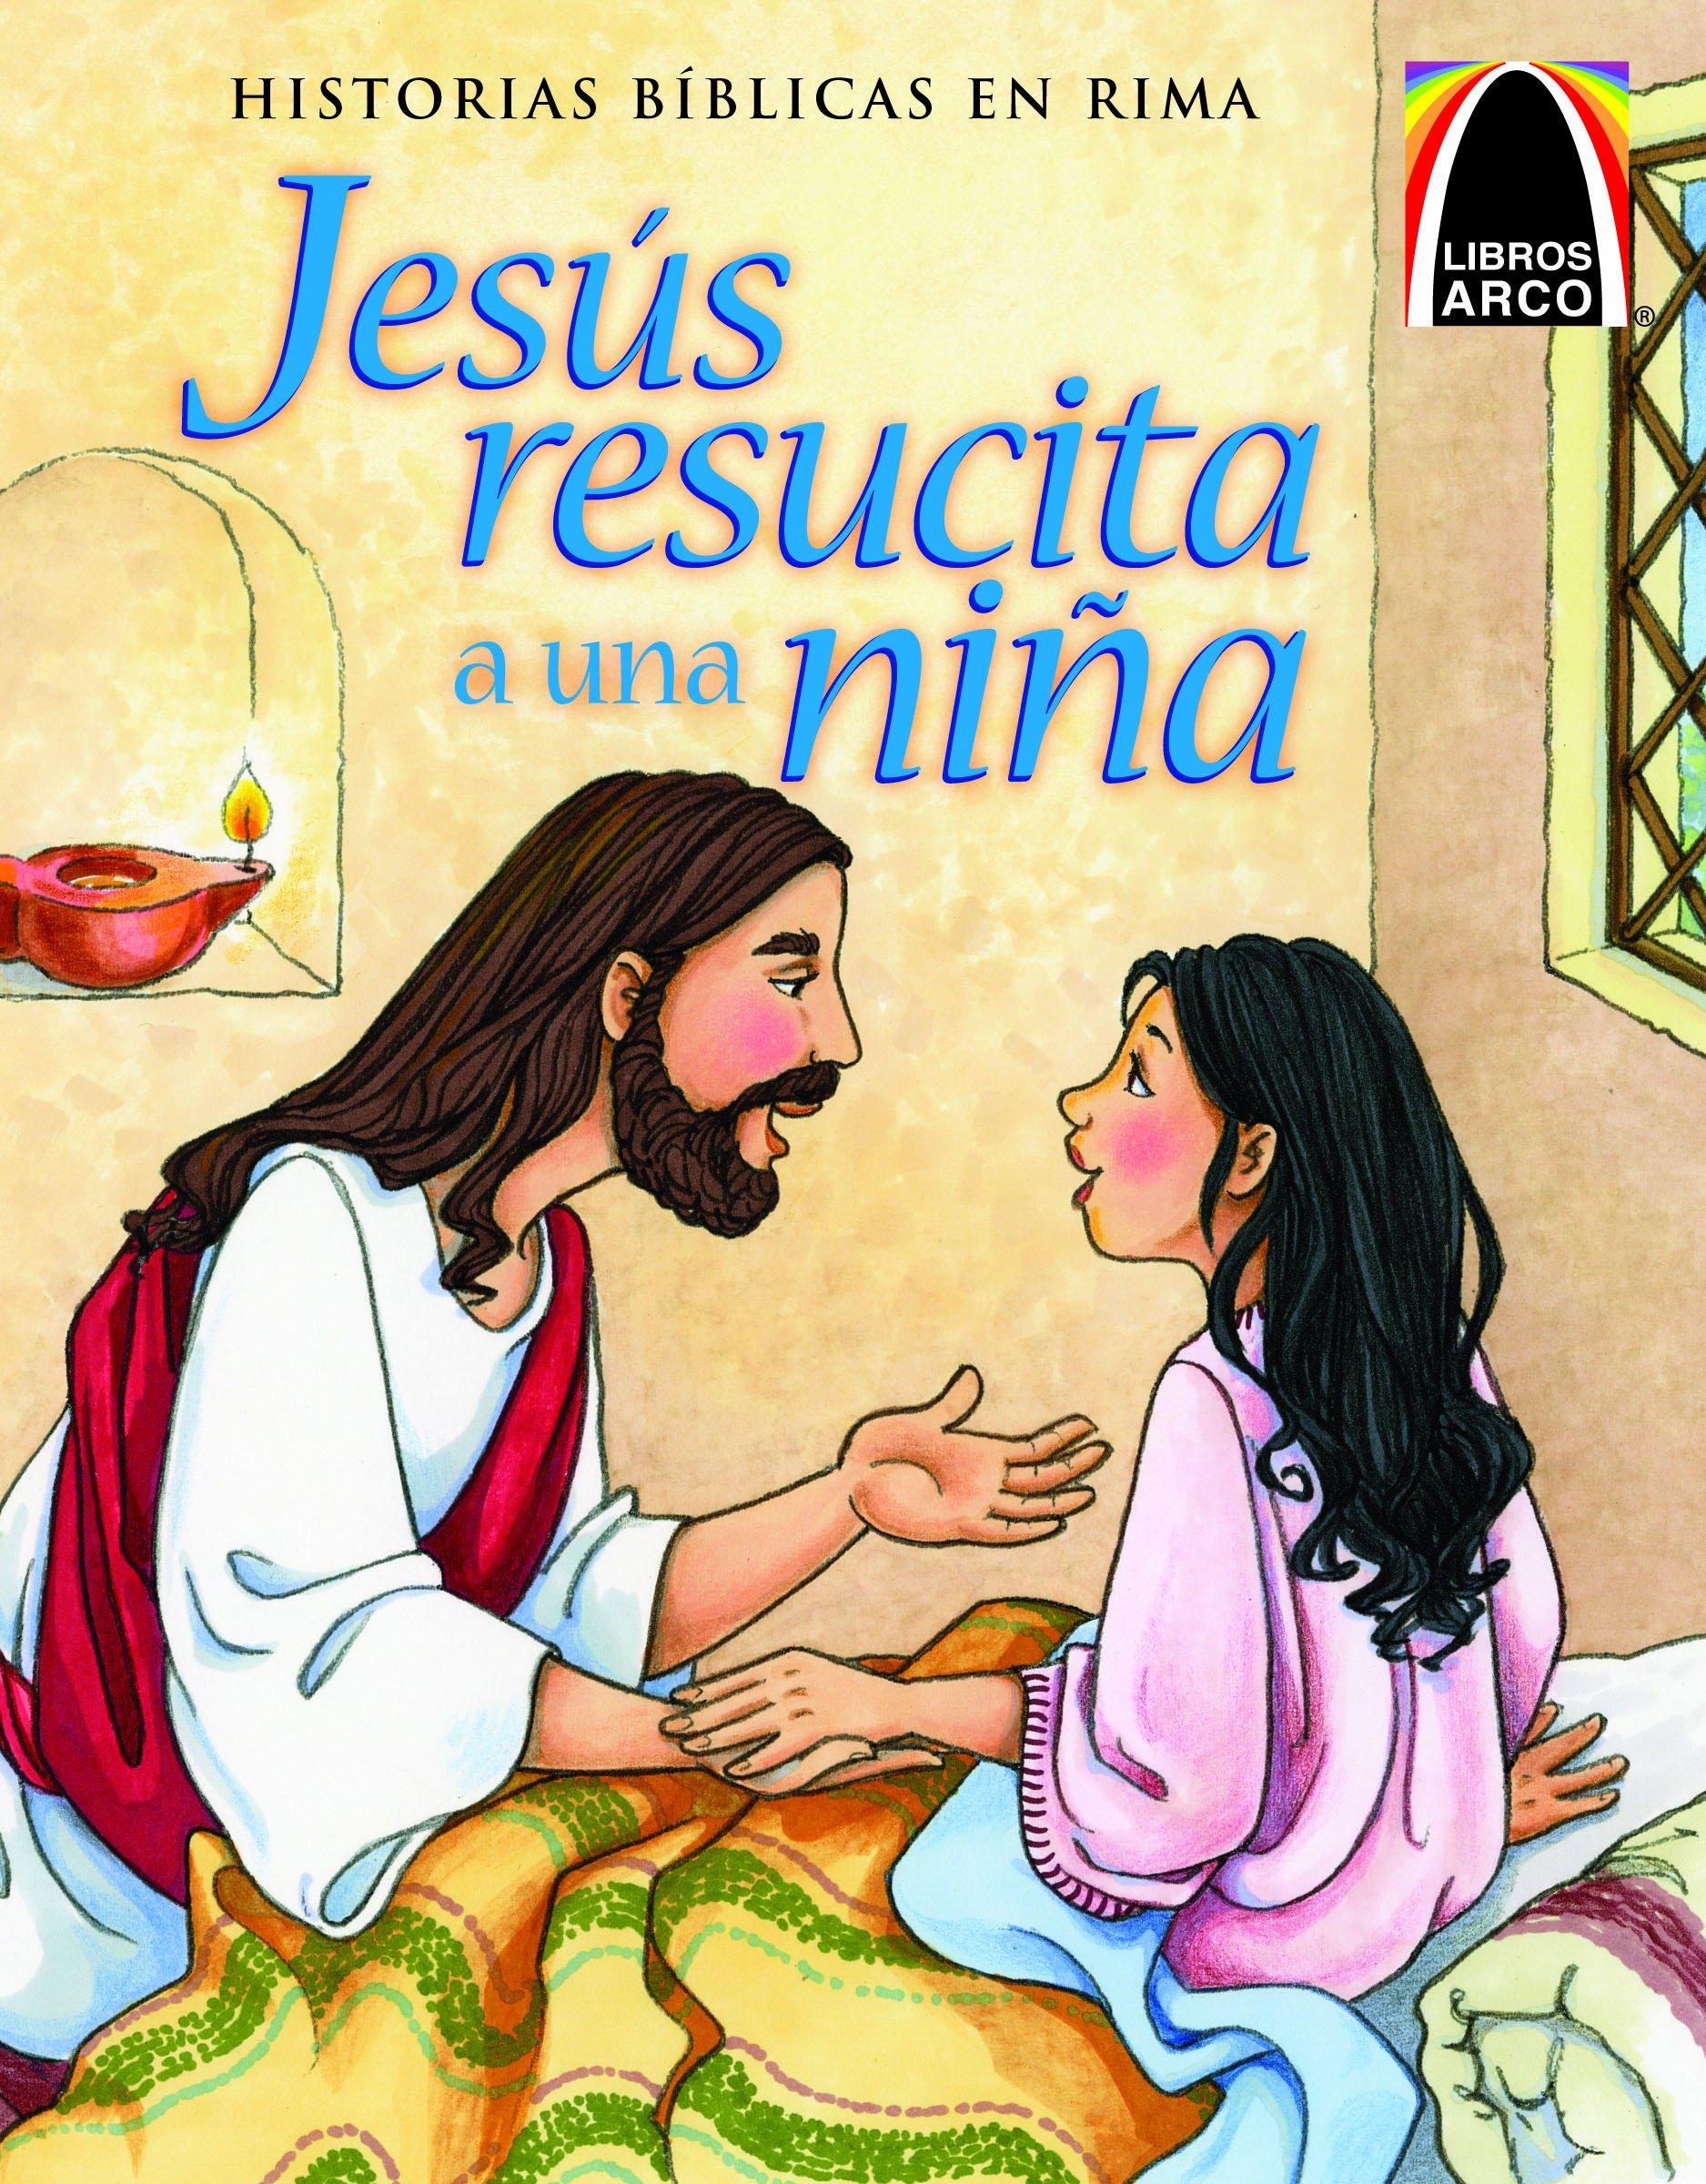 Jesus resucita a una nina (Jesus Wakes the Little Girl) (Historias Biblicas En Rima) (Spanish Edition) (Libros Arco / Arch Books)